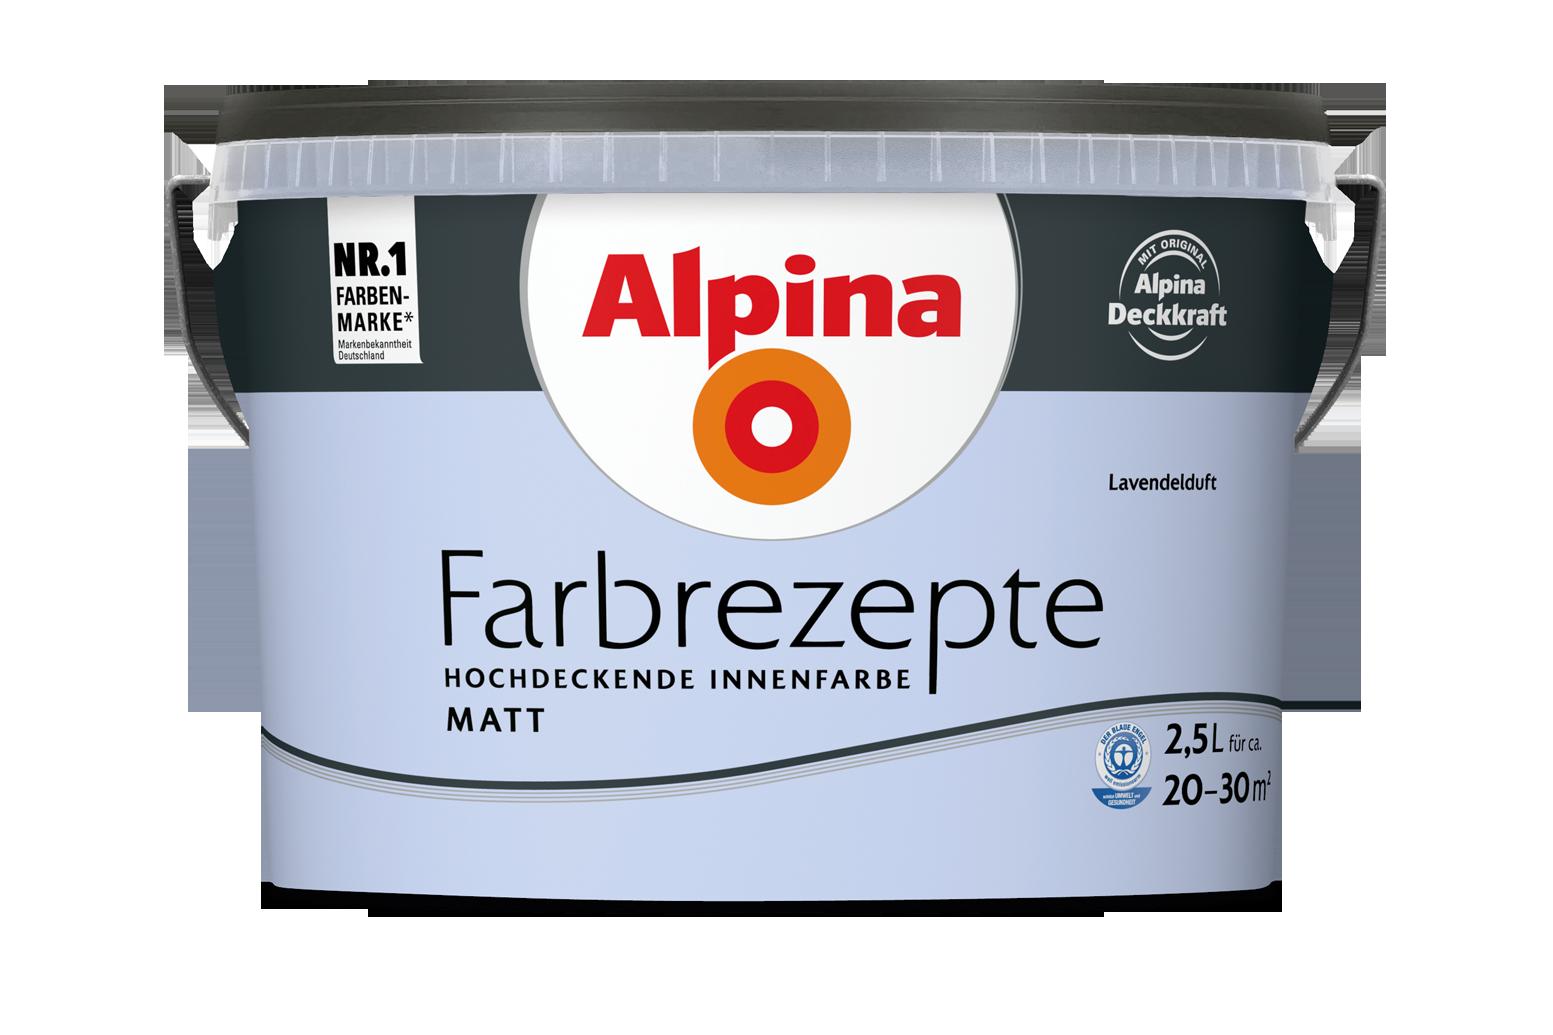 Innenfarbe in Violett, Lavendel streichen: Alpina Farbrezepte ...